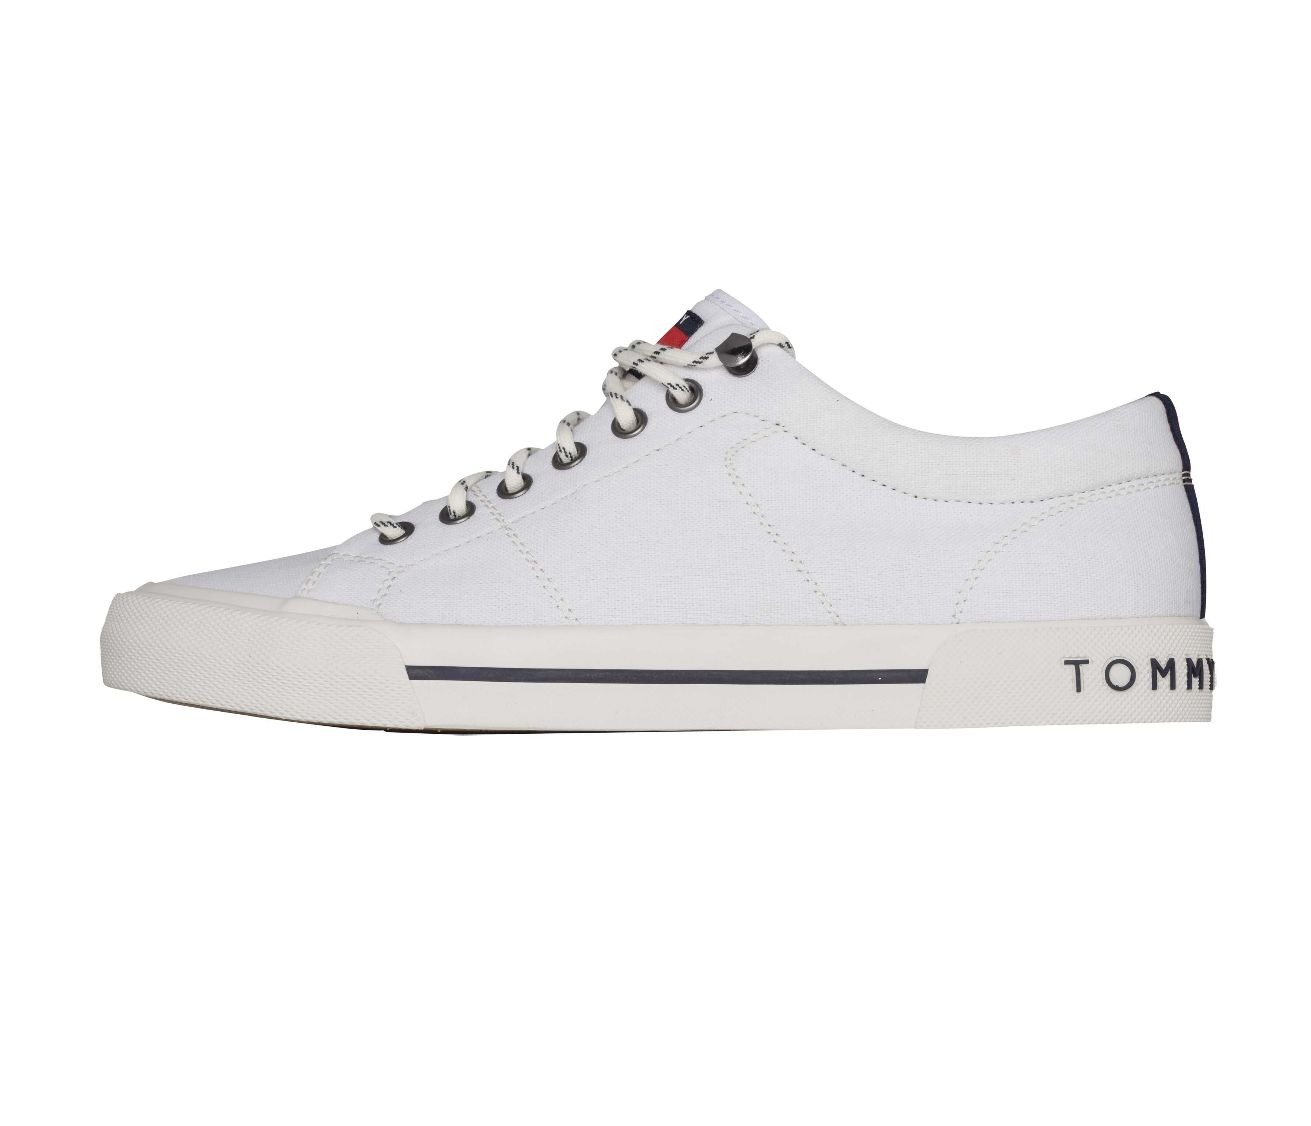 0aa35407ad Tommy Hilfiger Yarmout férfi utcai cipő , Férfi cipő | utcai cipő ...